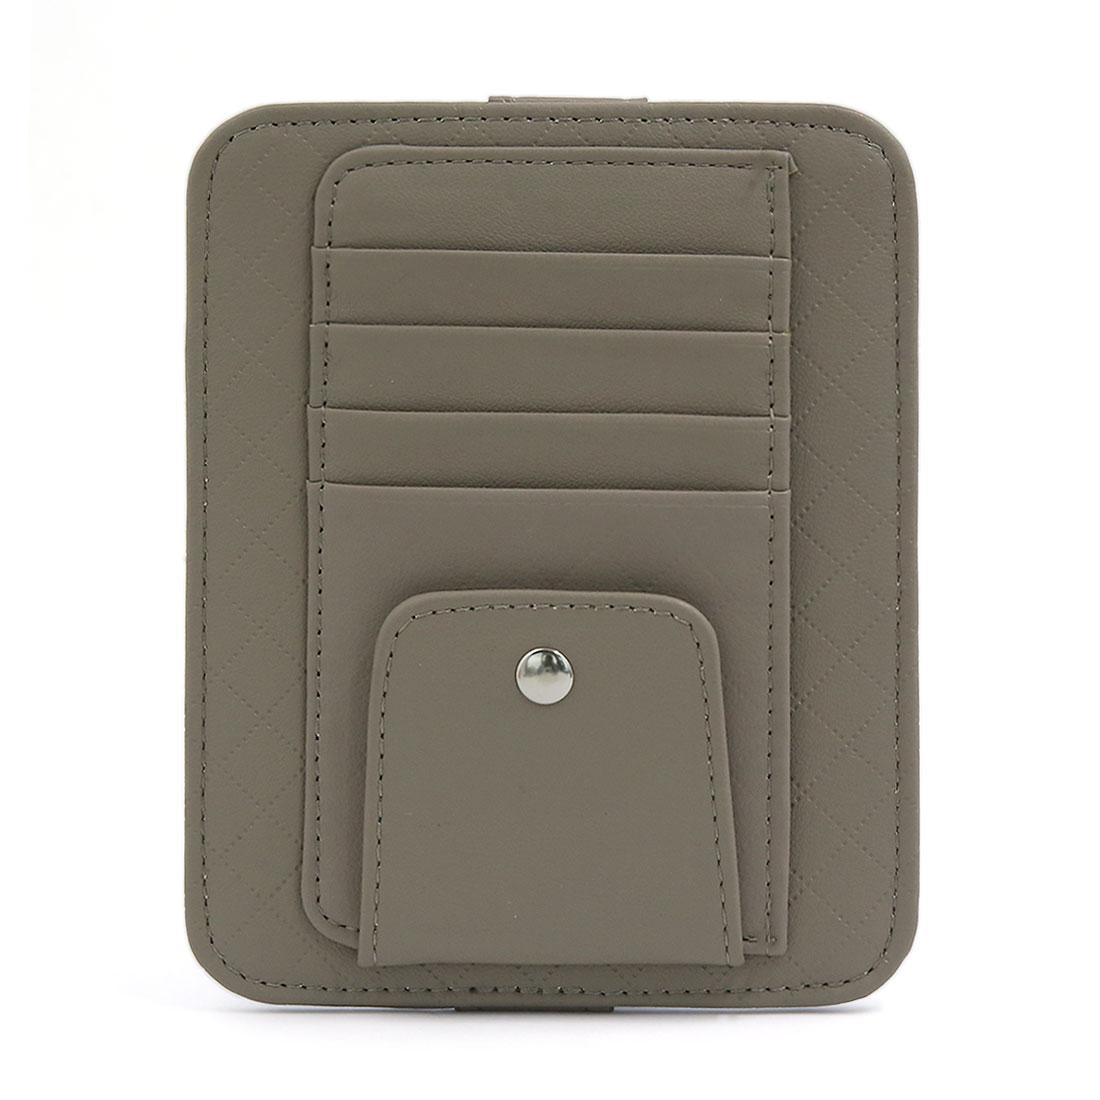 X autohaux gray faux leather car sun visor organizer business card x autohaux gray faux leather car sun visor organizer business card storage case auto sunglass holder colourmoves